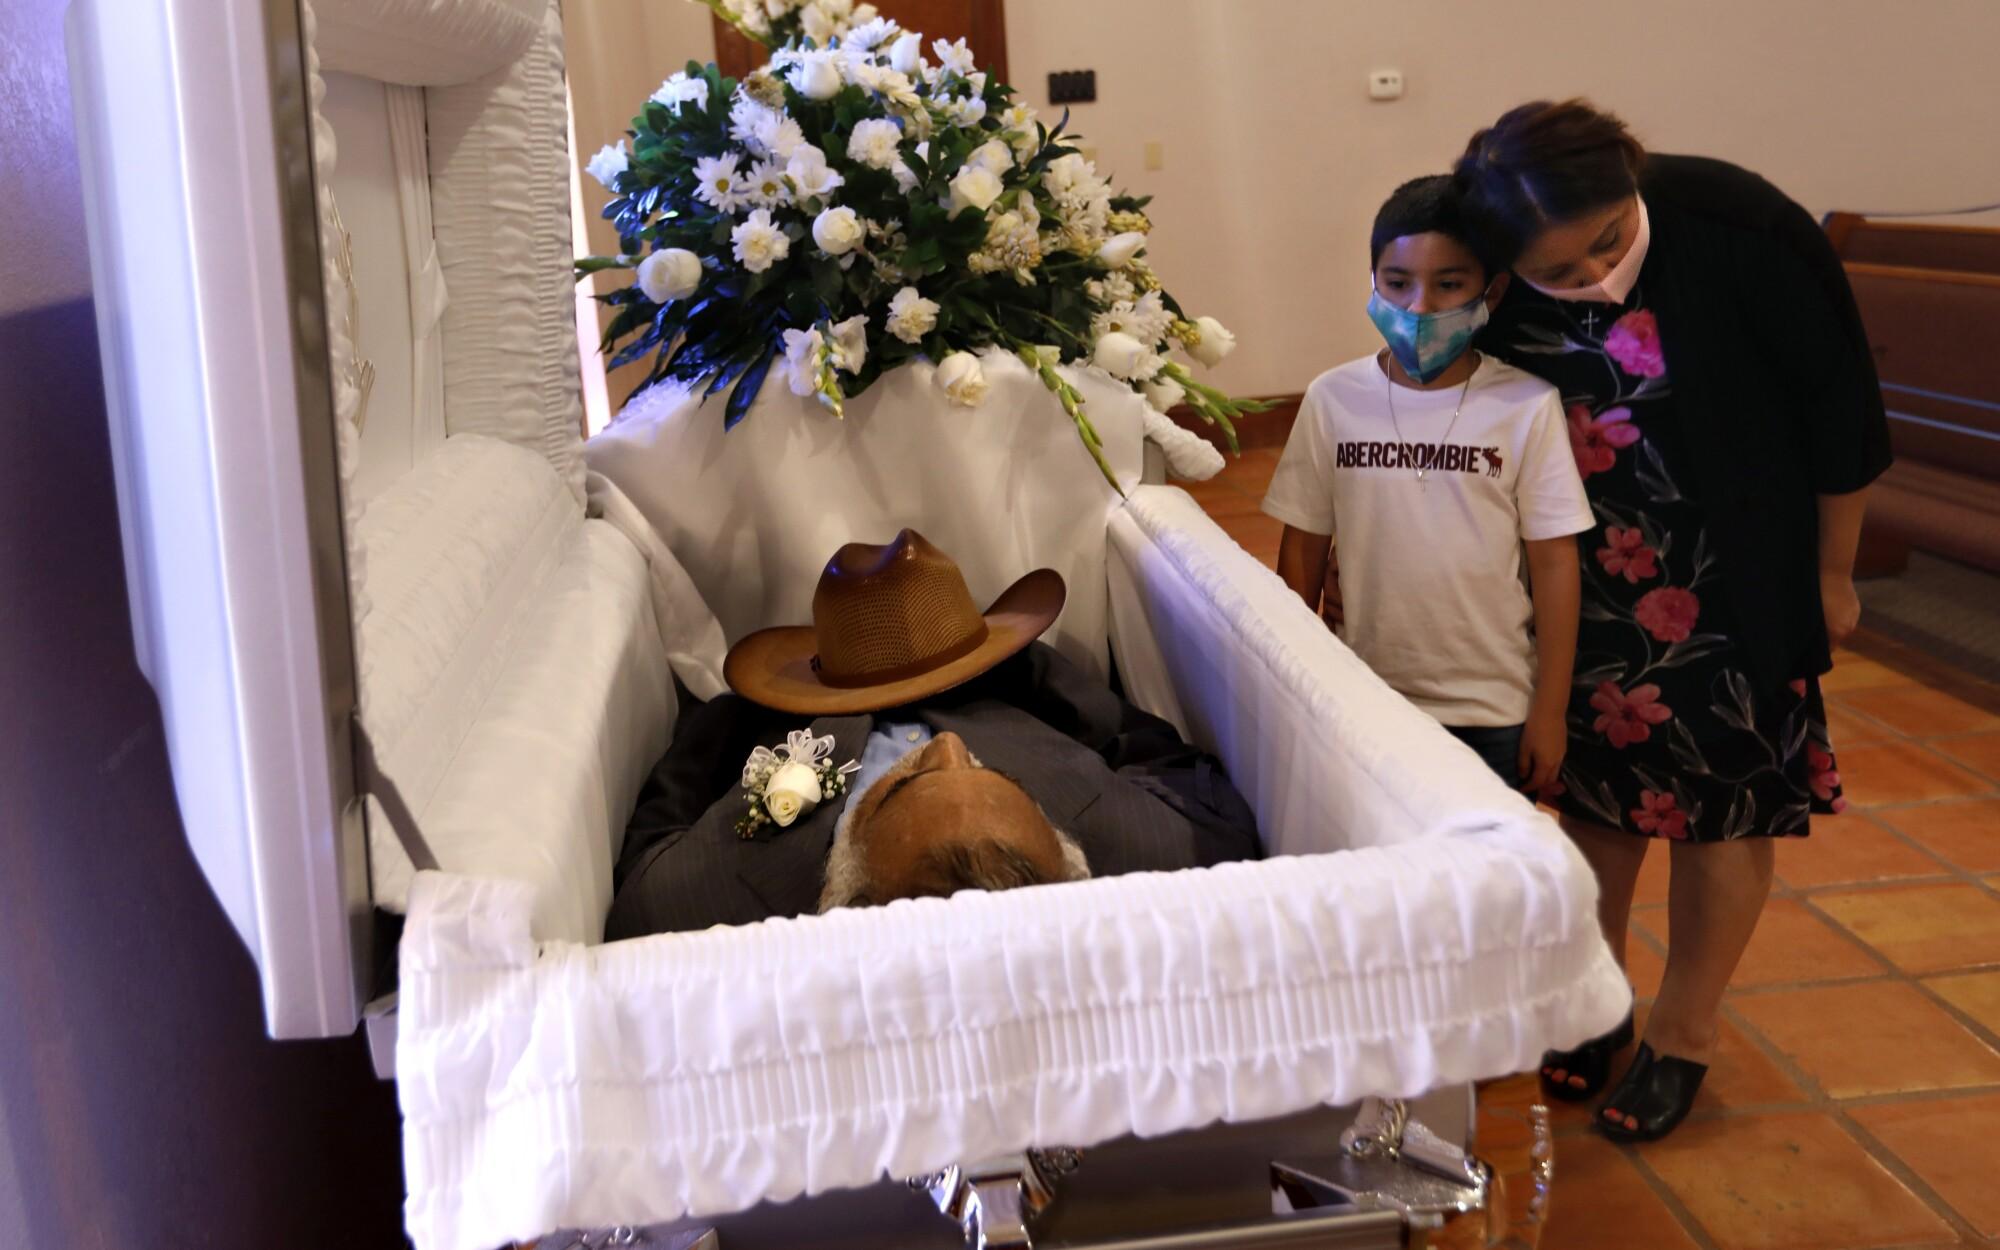 A funeral in McAllen, Texas